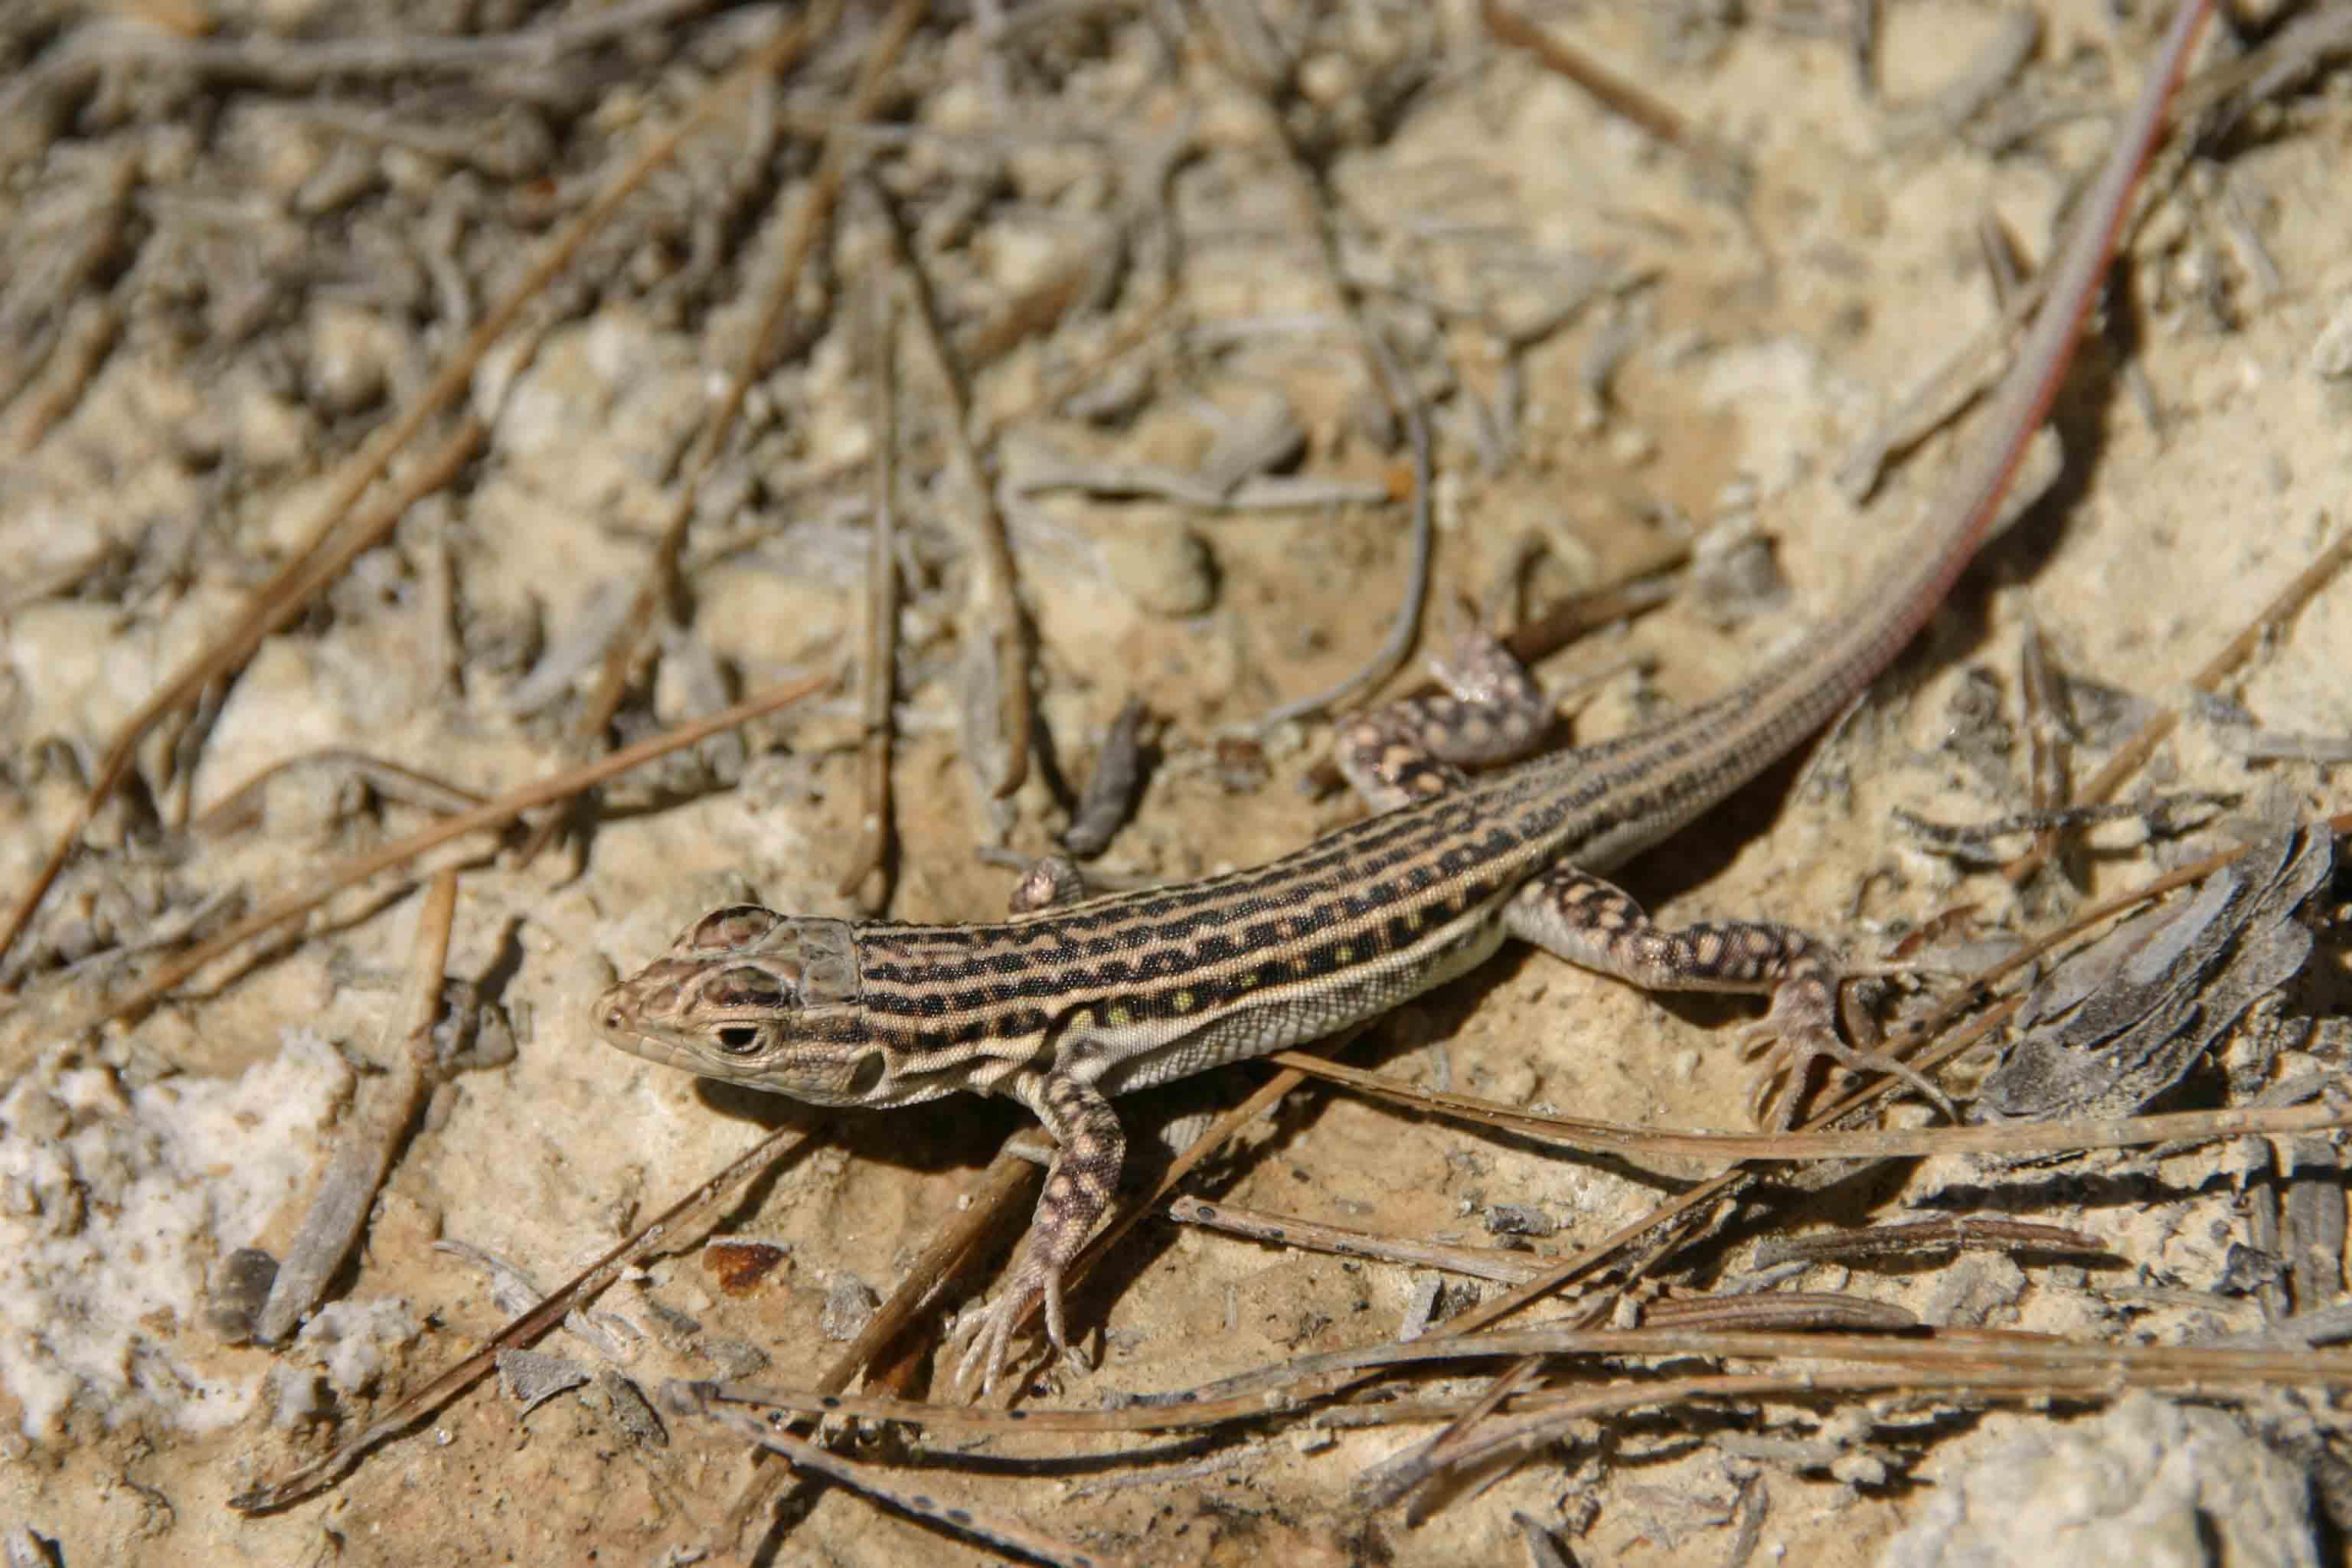 Spiny-footed lizard (Acanthodactylus erythrurus)